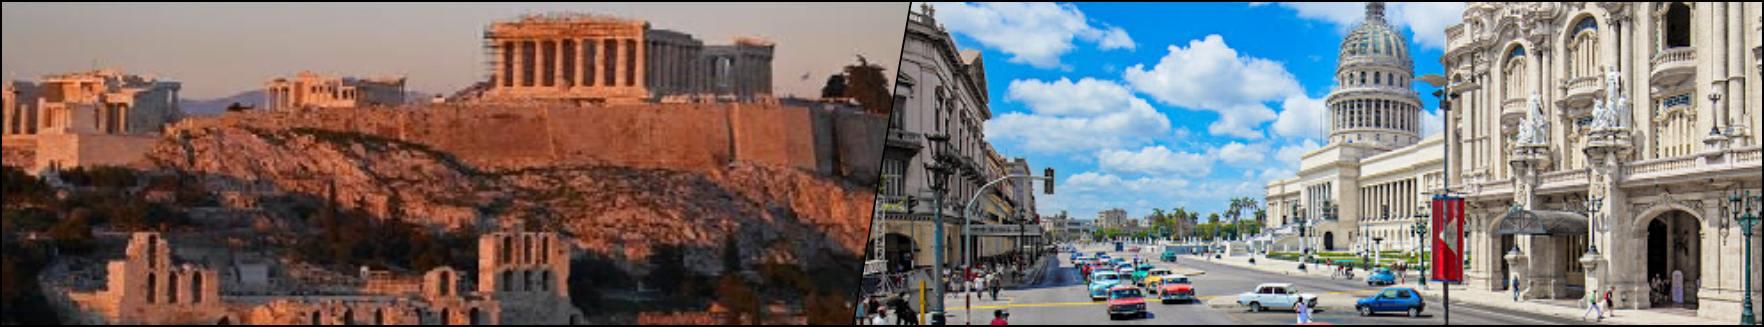 Athens - Havana